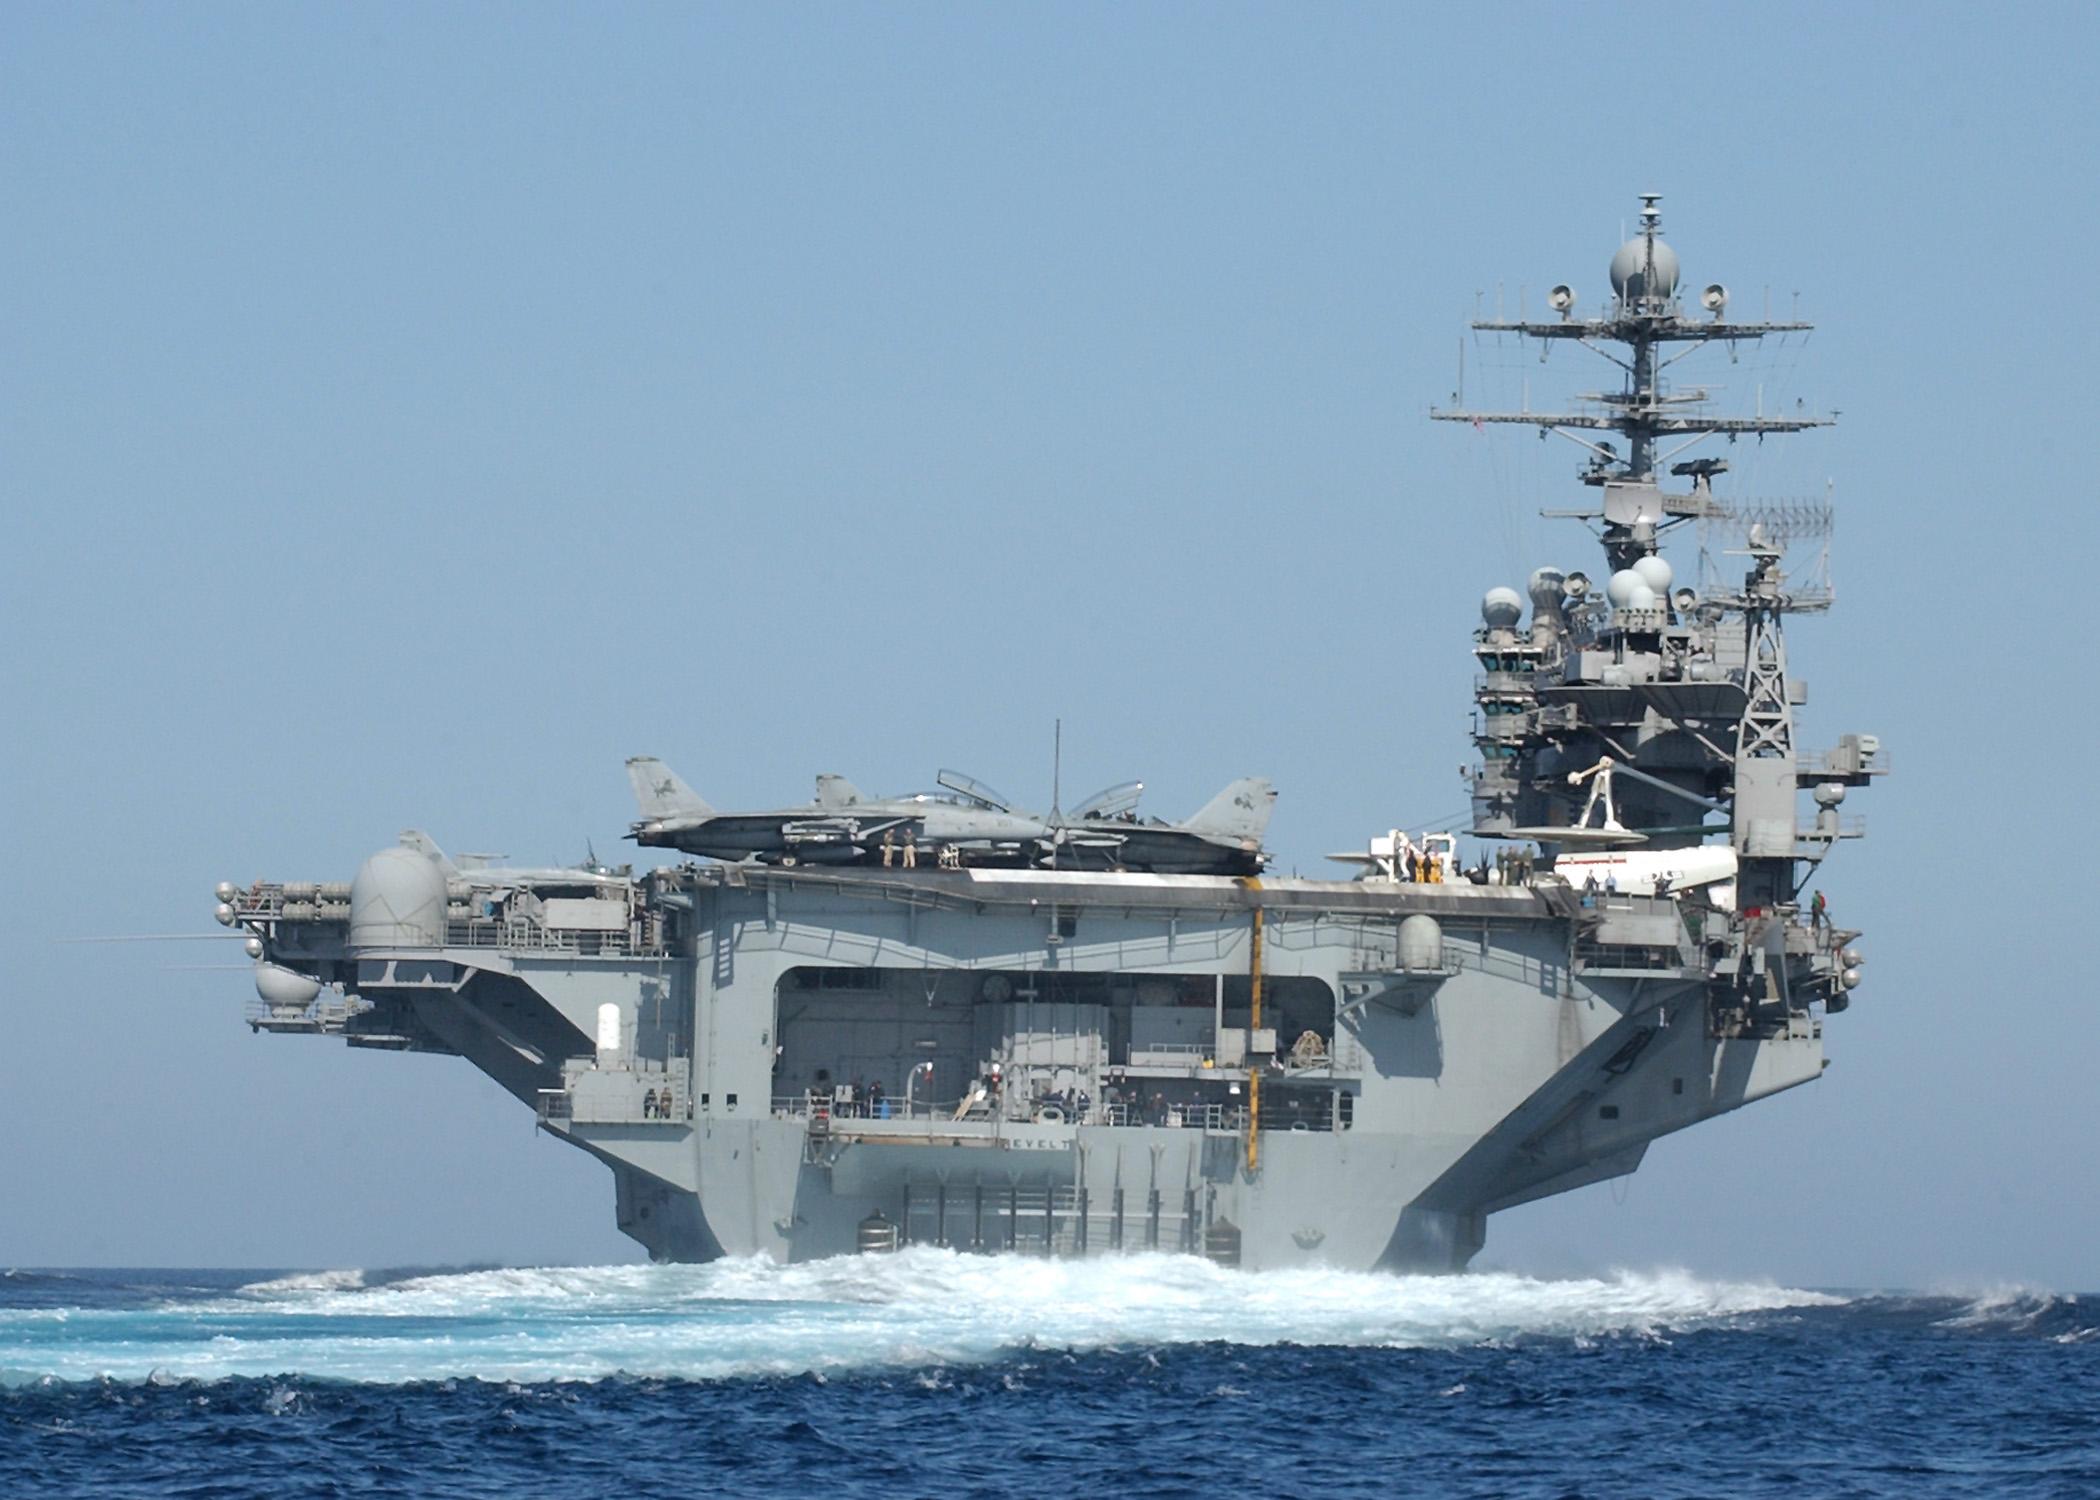 World S Largest Cruise Ship File Uss Theodore Roosevelt Souda Bay Jpg Wikimedia